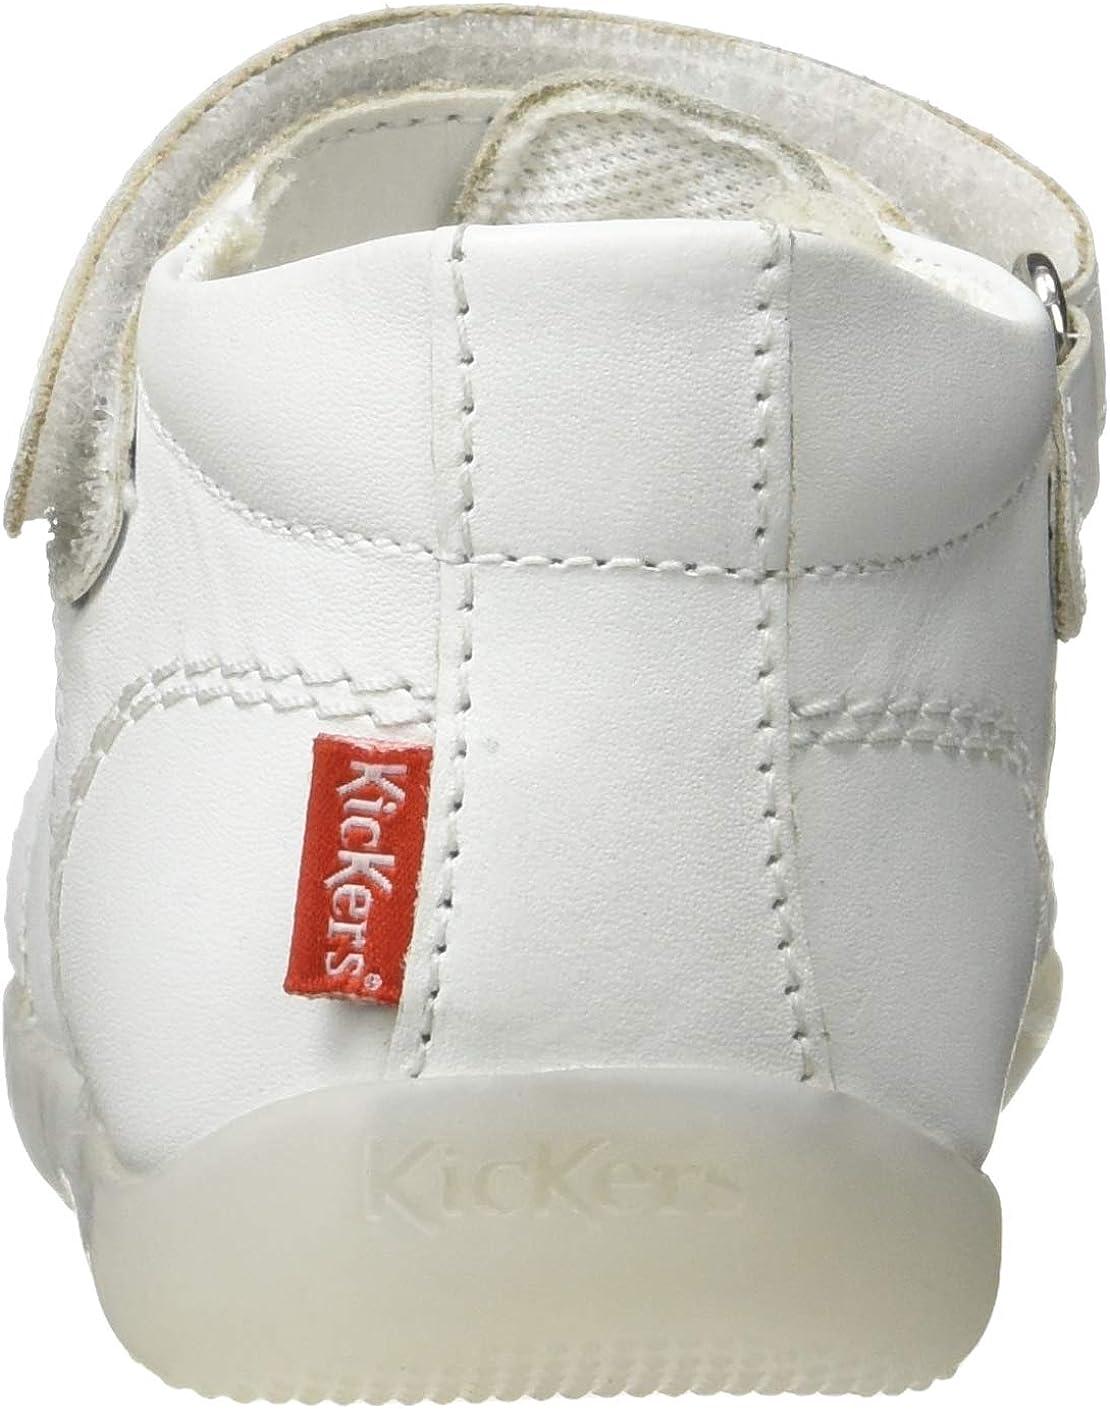 Kickers Bigflo-2 Sandales Mixte b/éb/é